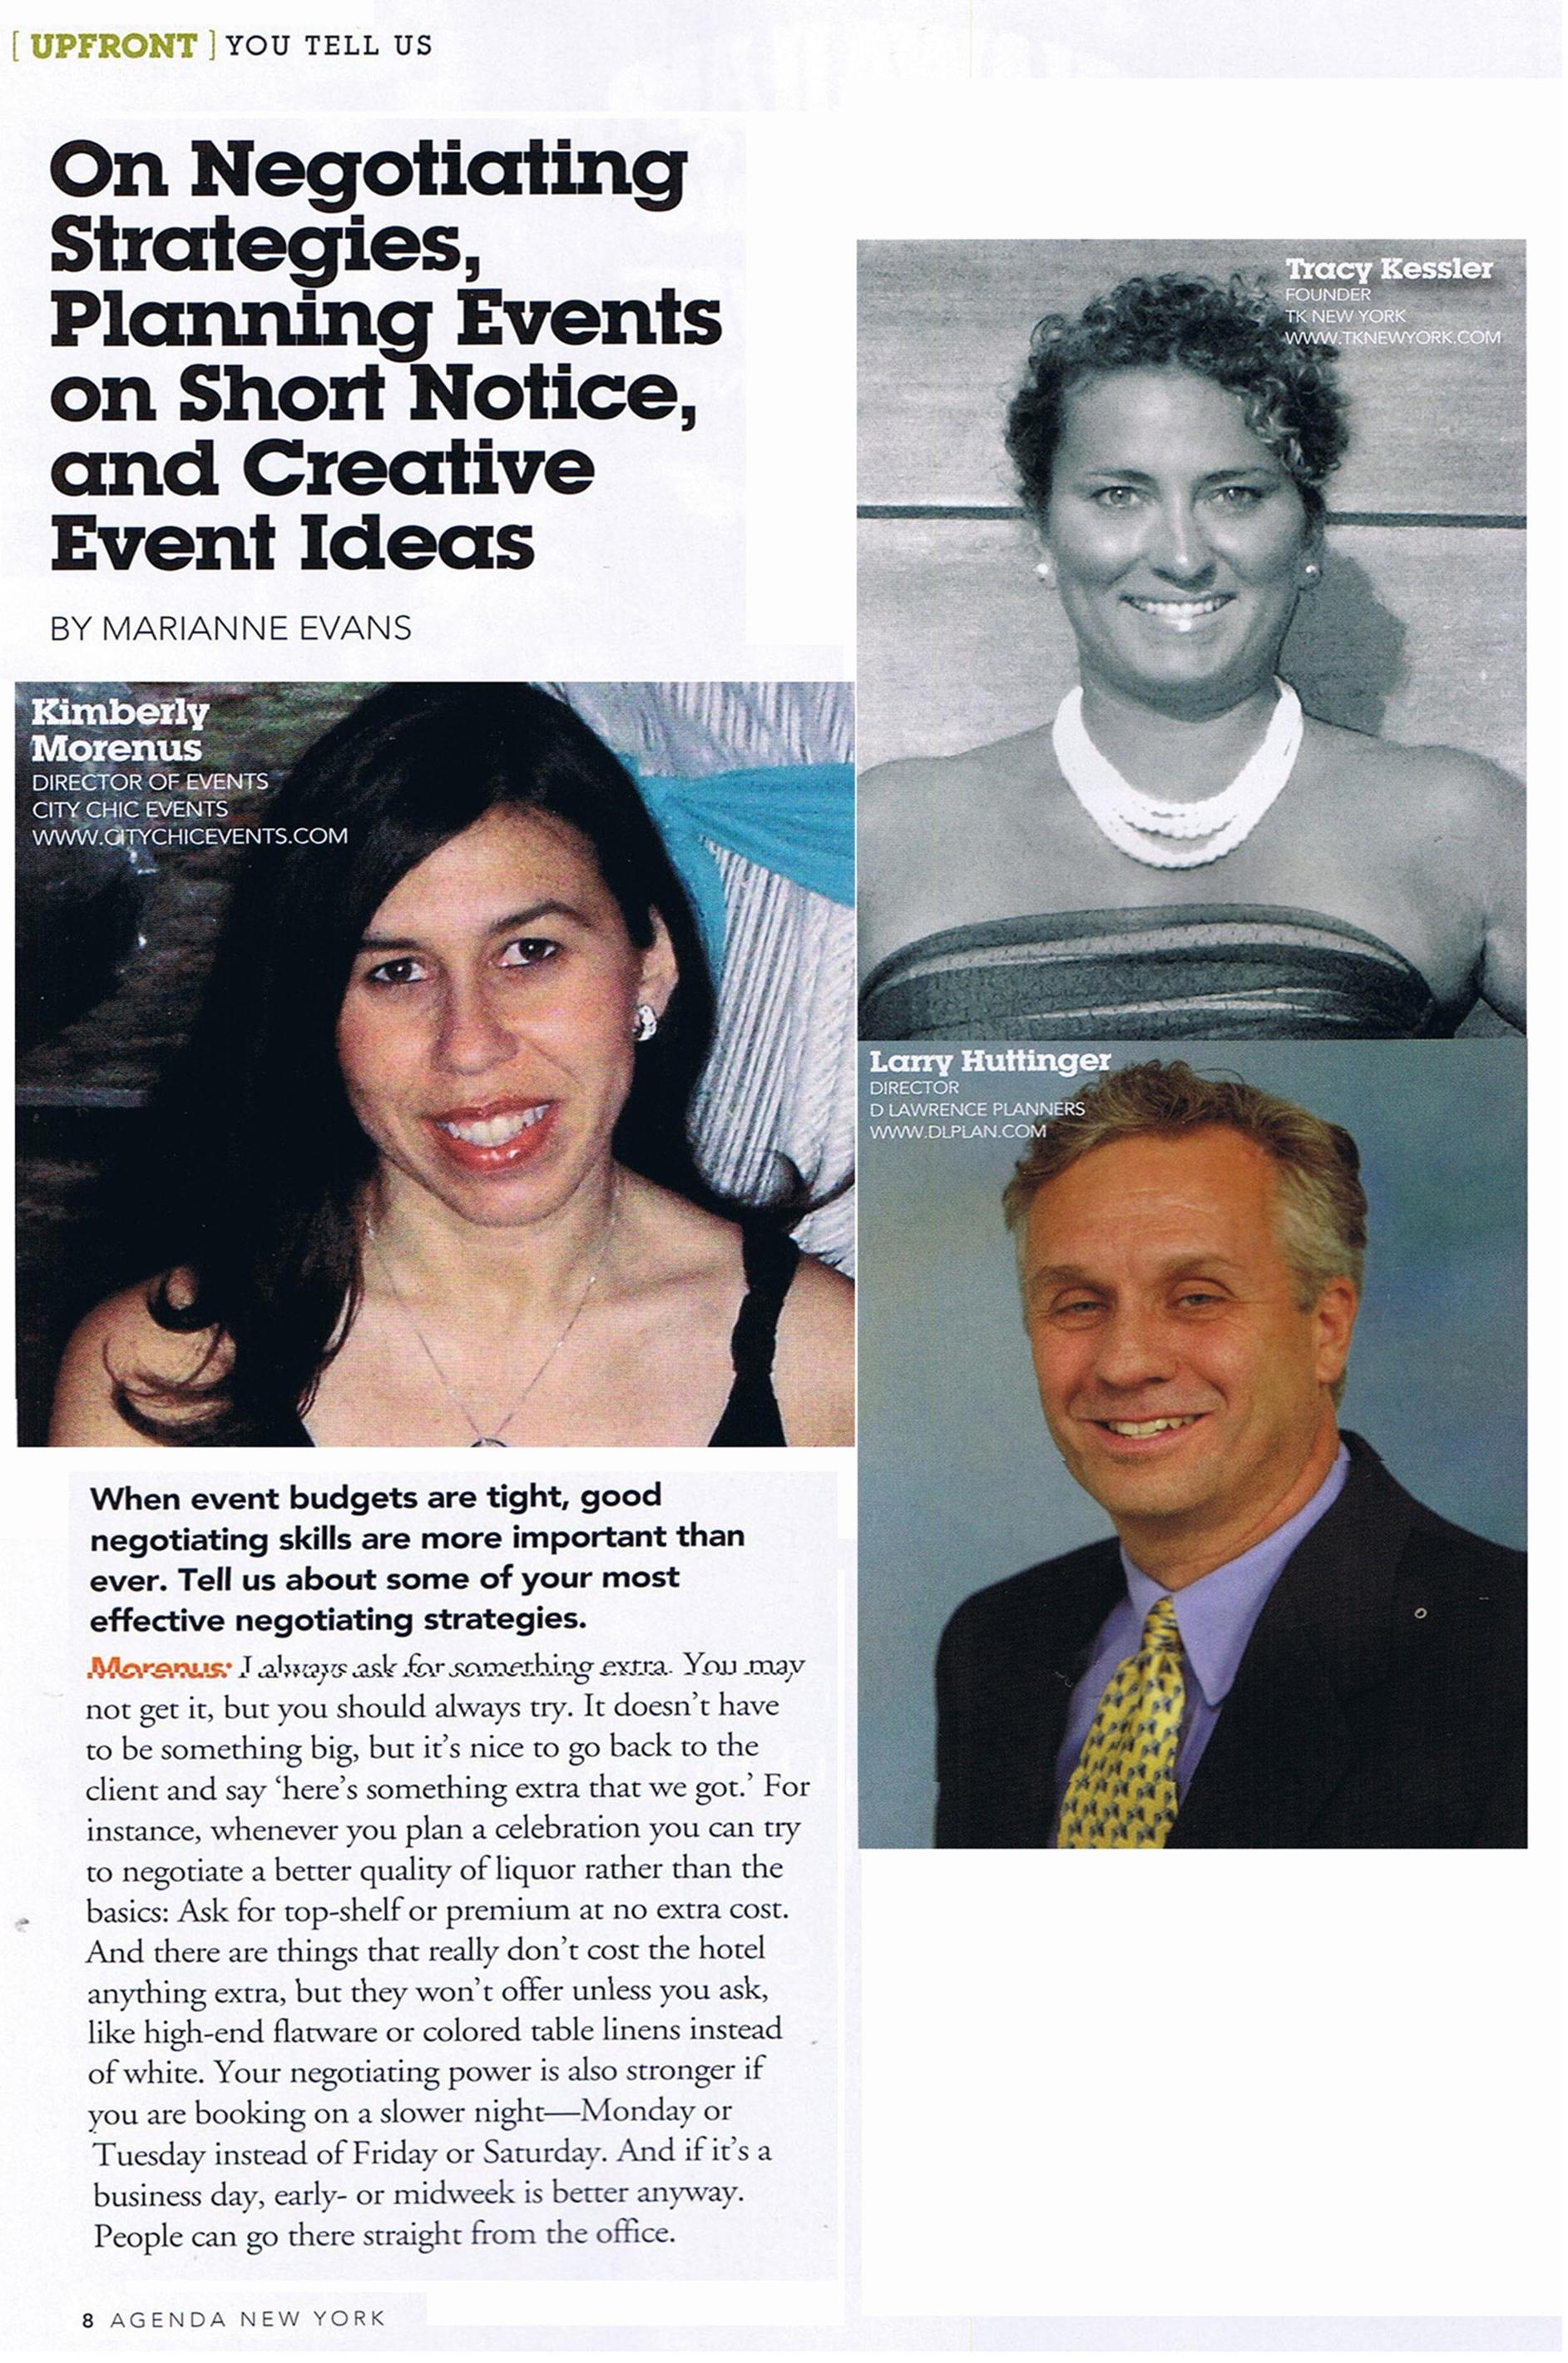 Agenda Magazine